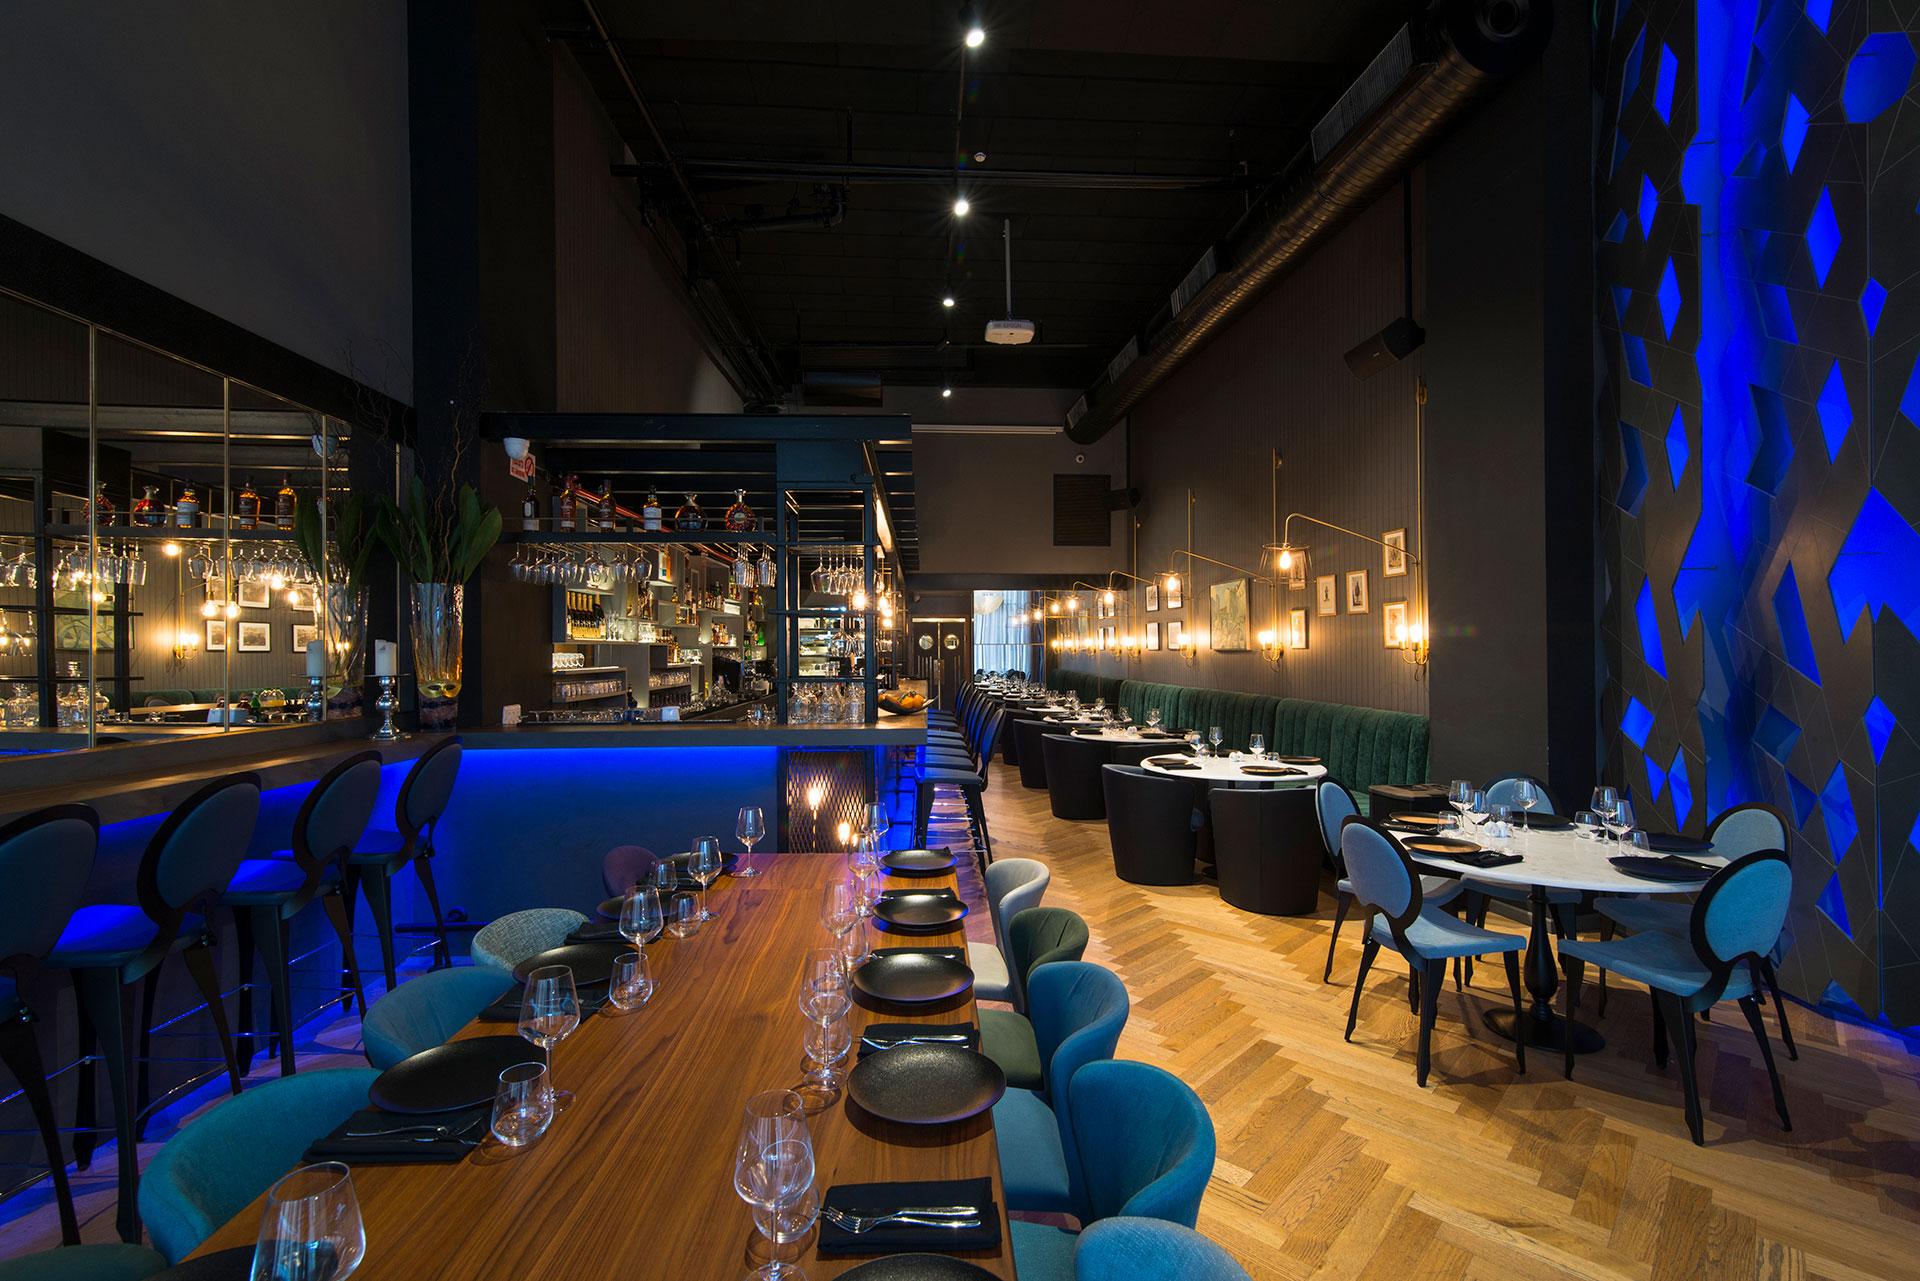 SIX13 Lounge Bar